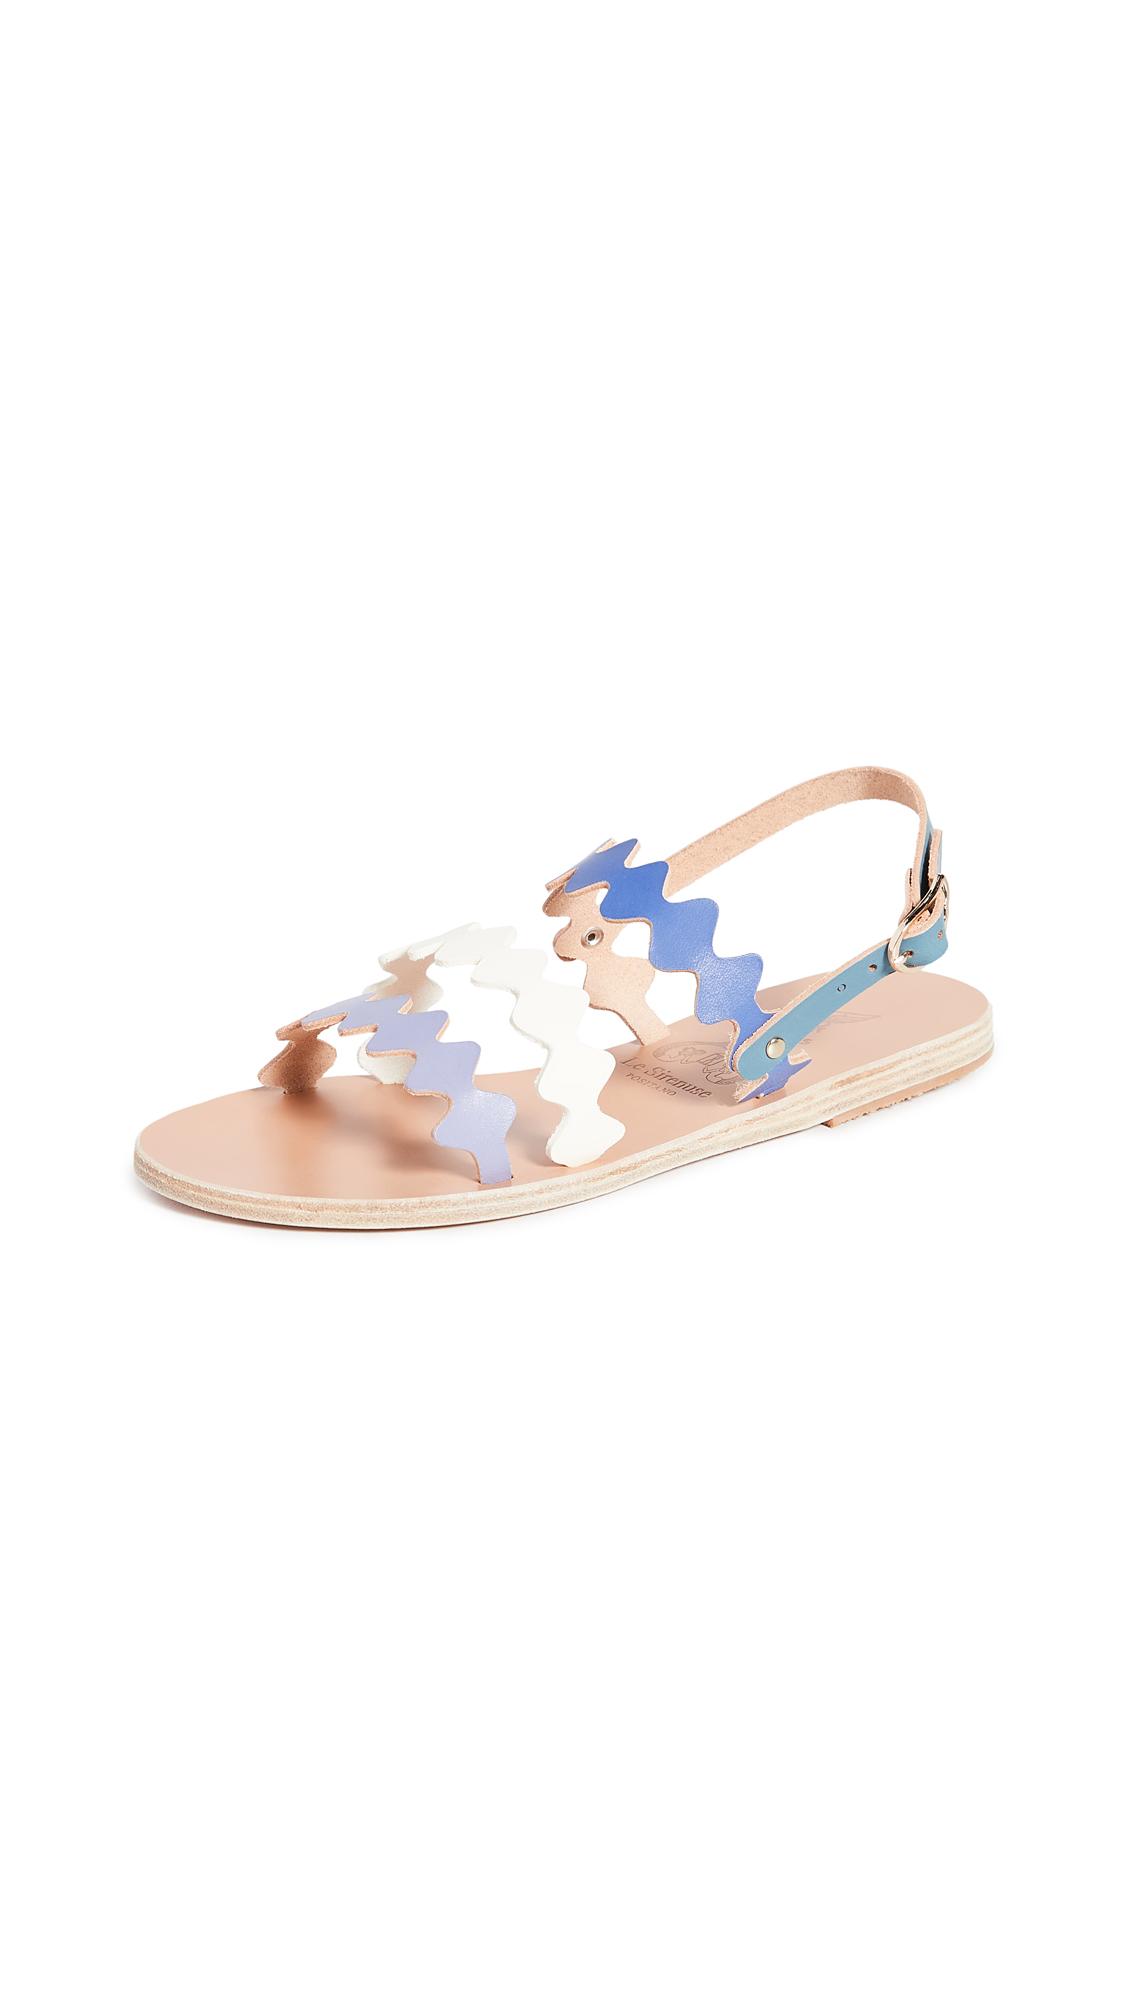 Buy Ancient Greek Sandals x Le Sirenuse Positano Clio Onda Sandals online, shop Ancient Greek Sandals